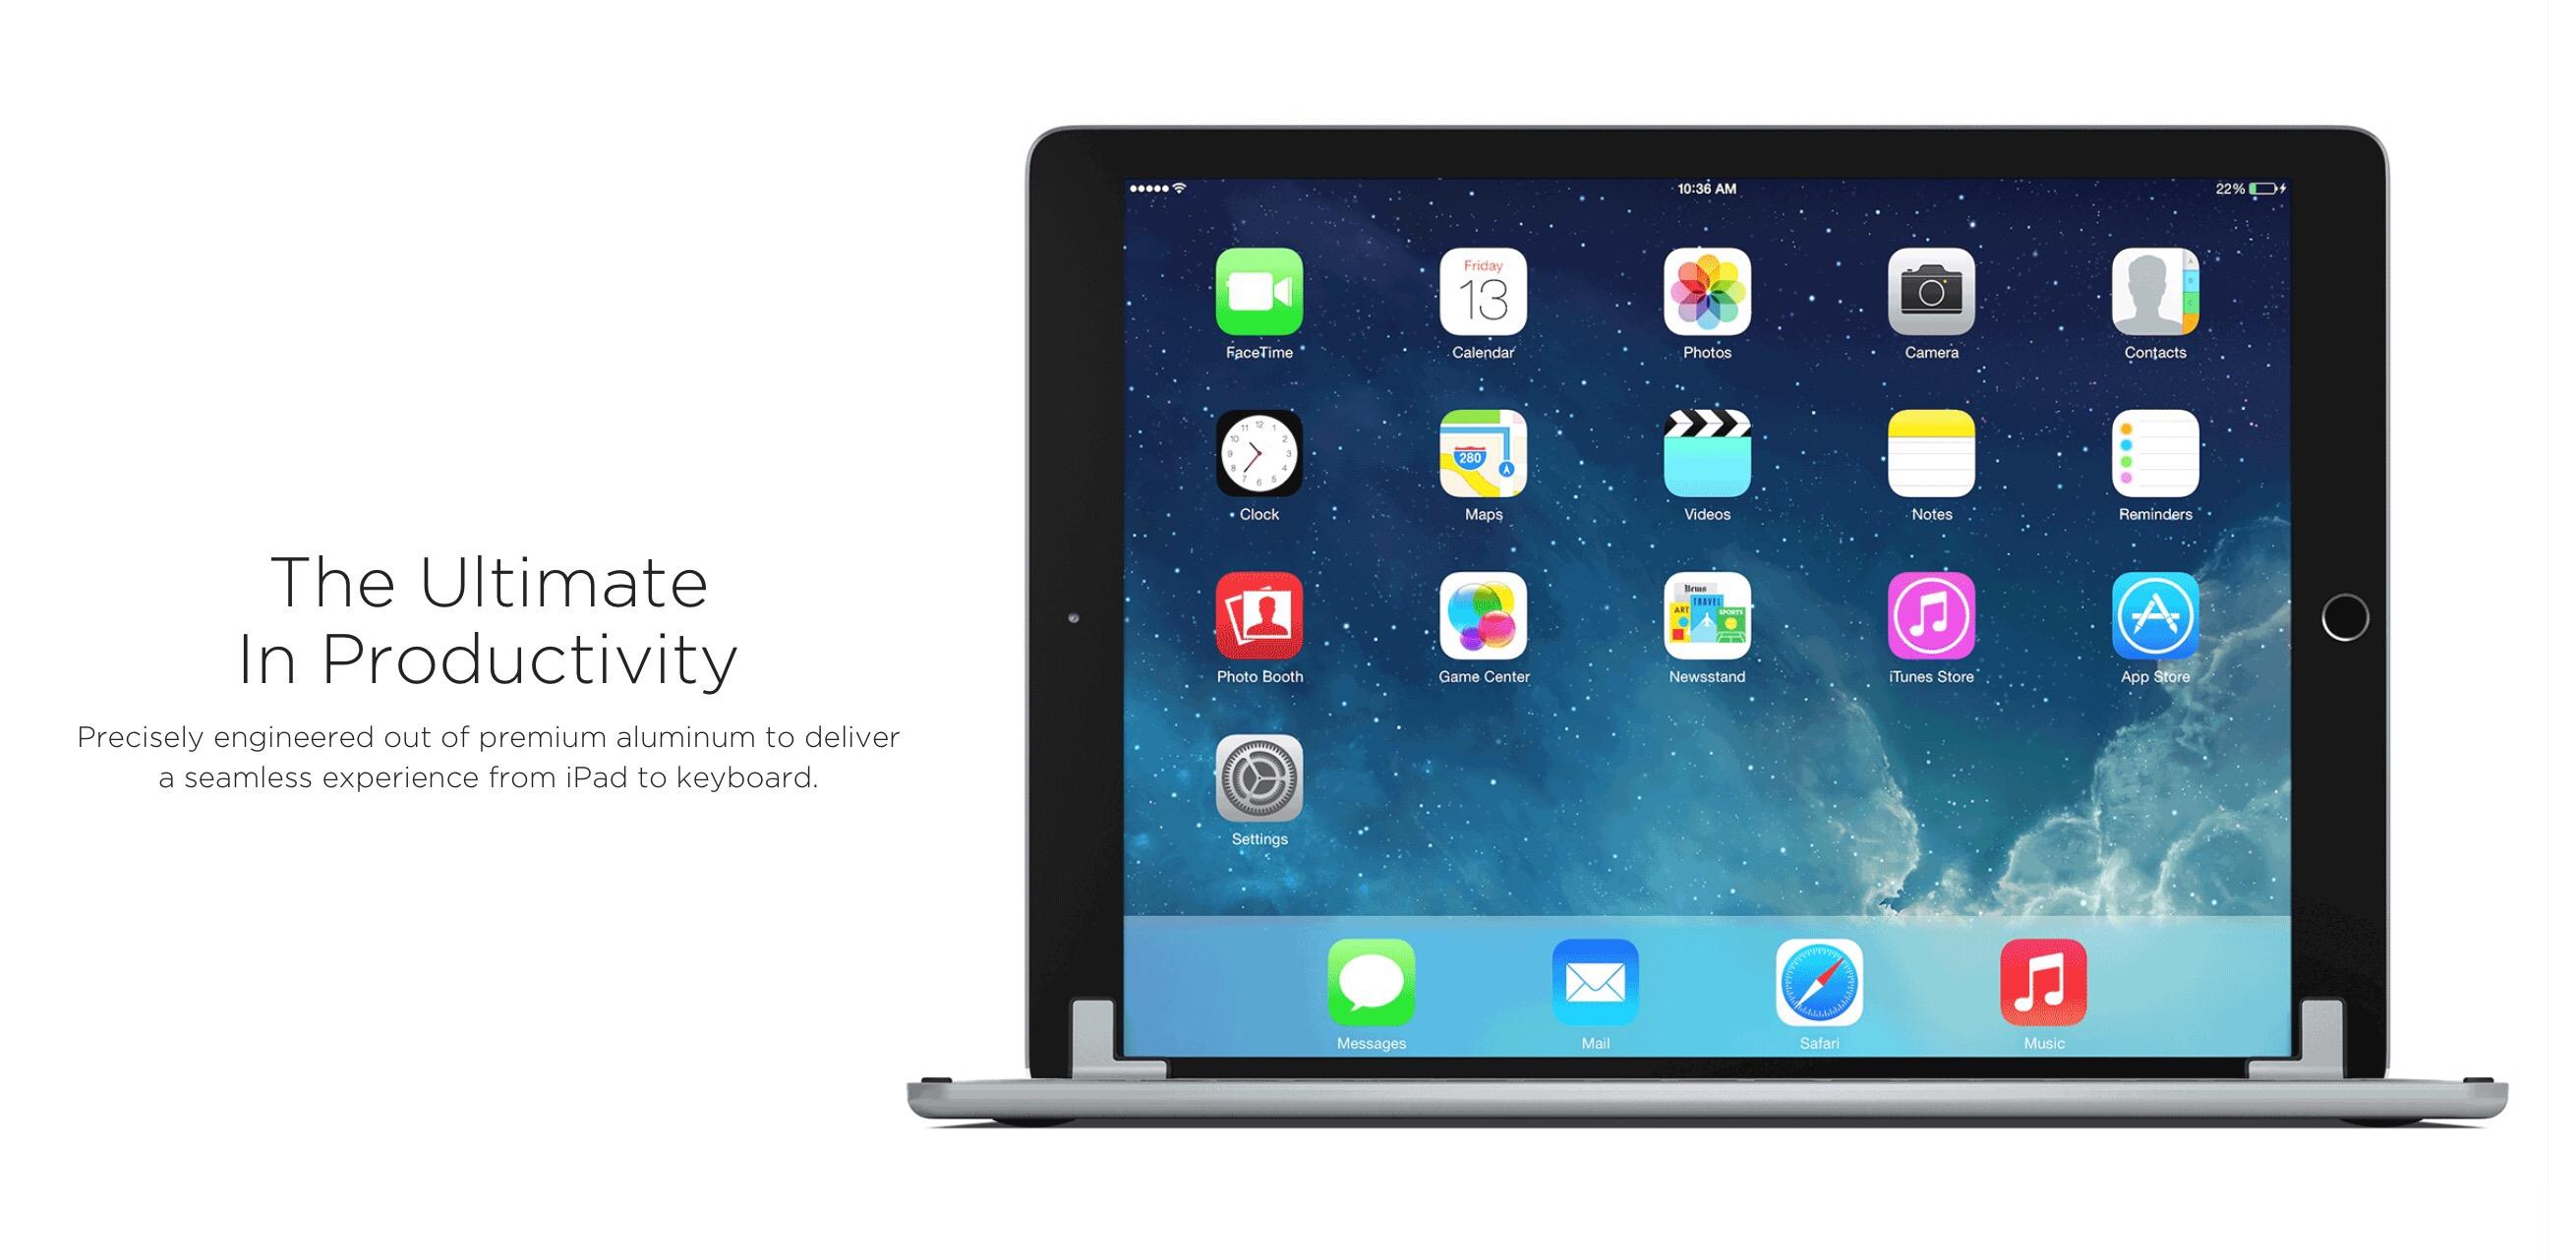 macbook photo booth app